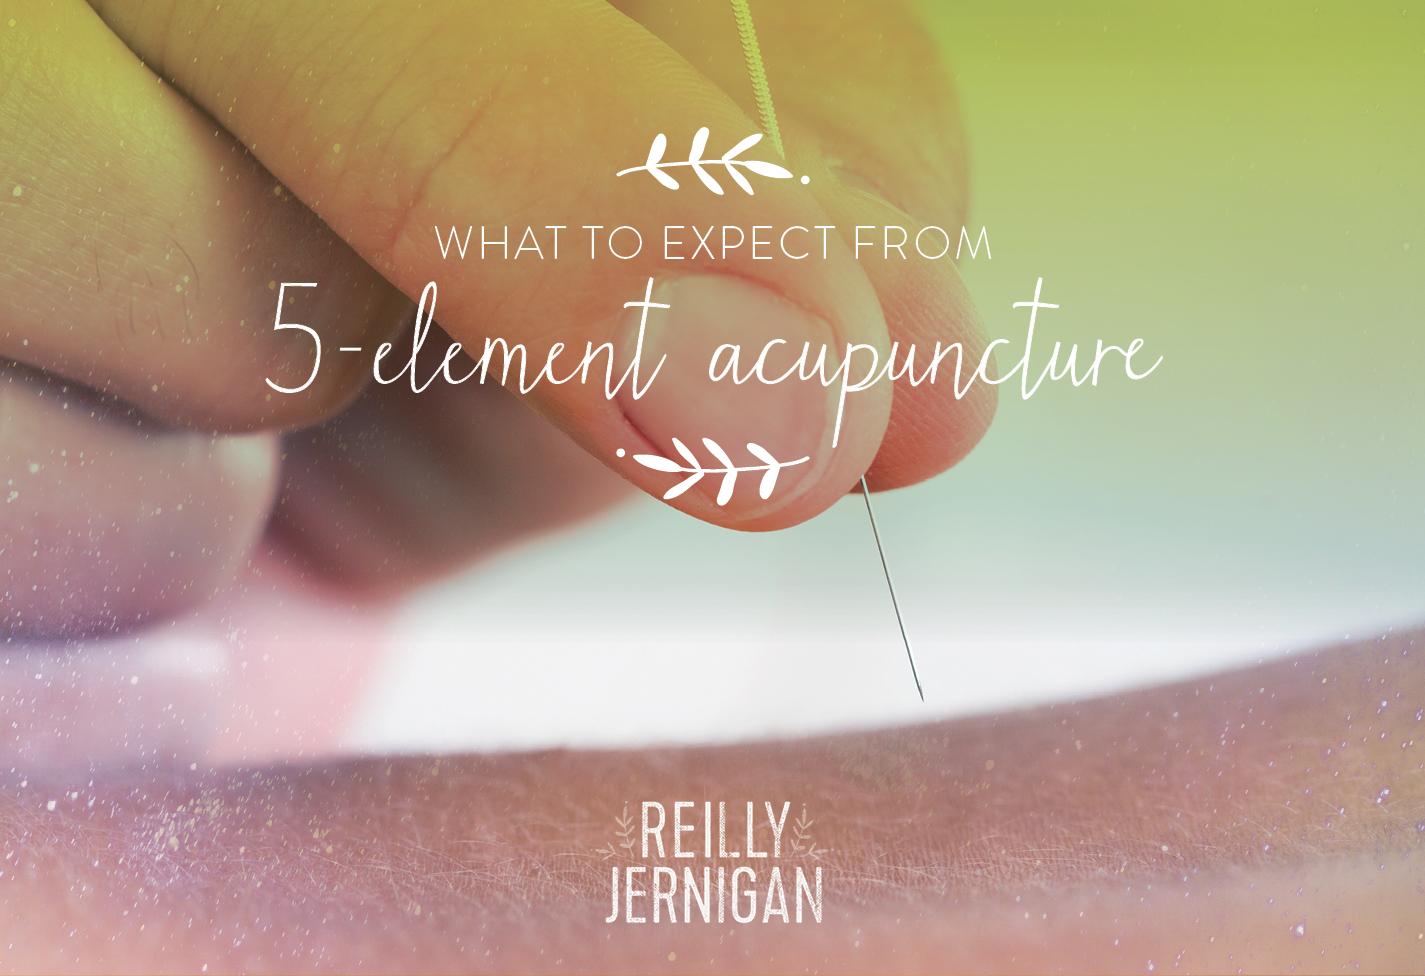 5-element-acupunture.jpg